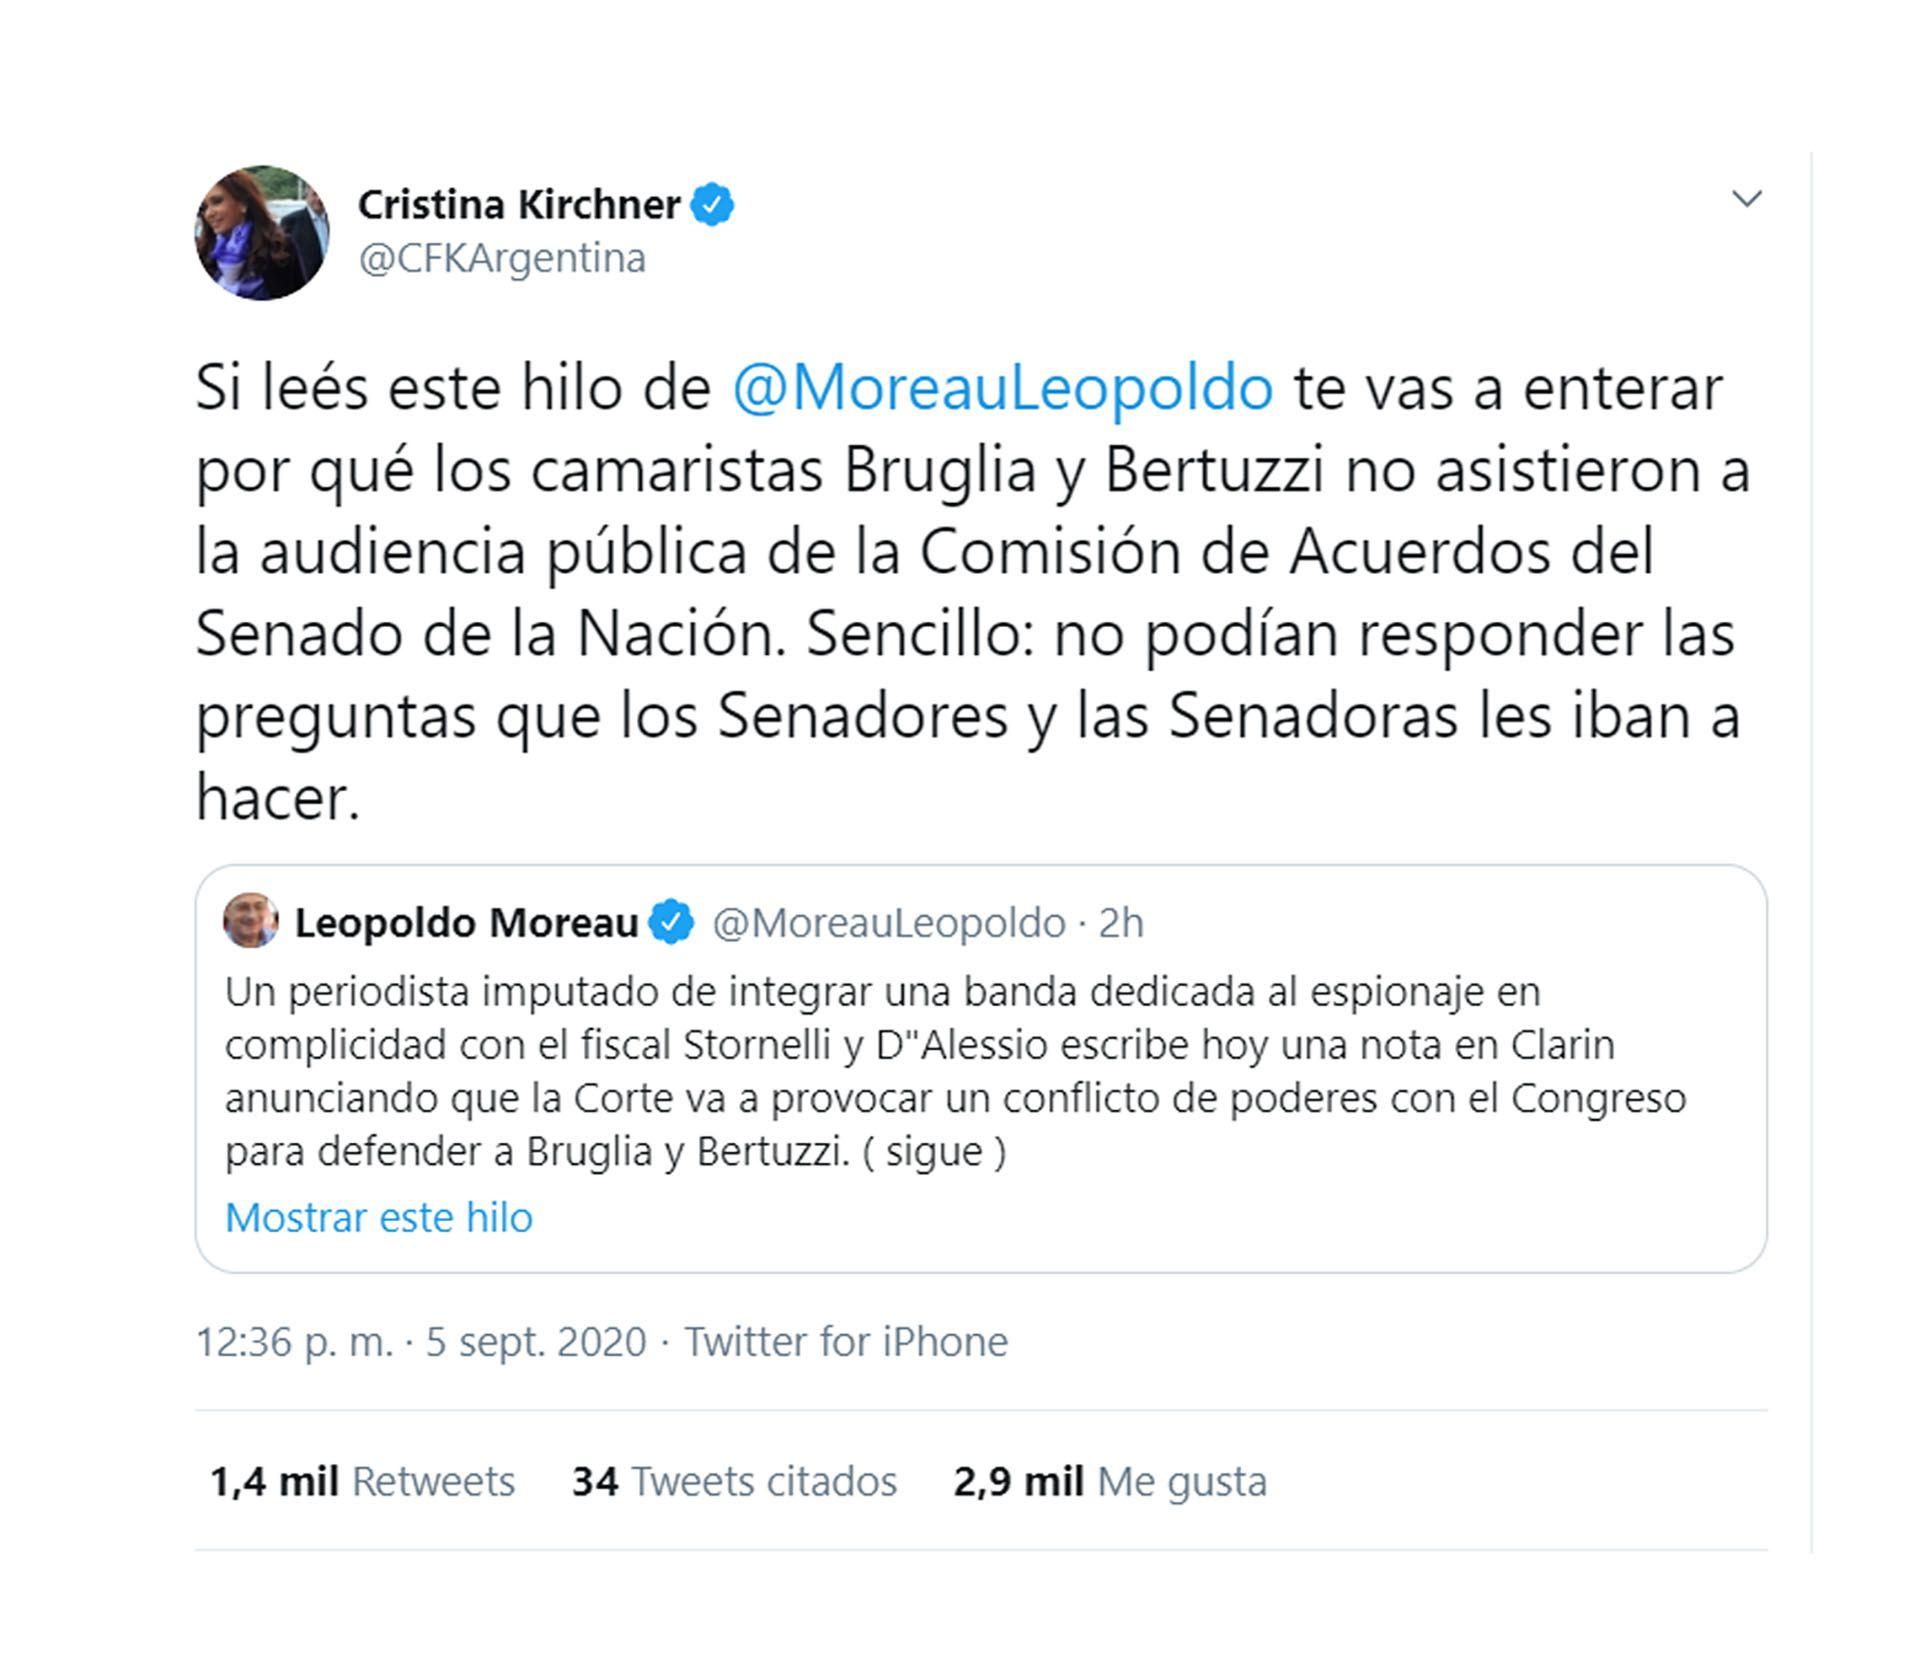 Cristina Kirchner avanzó contra dos camaristas federales que ratificaron su prisión preventiva en la causa Cuadernos | MULTIMEDIOS COLONIA AVELLANEDA